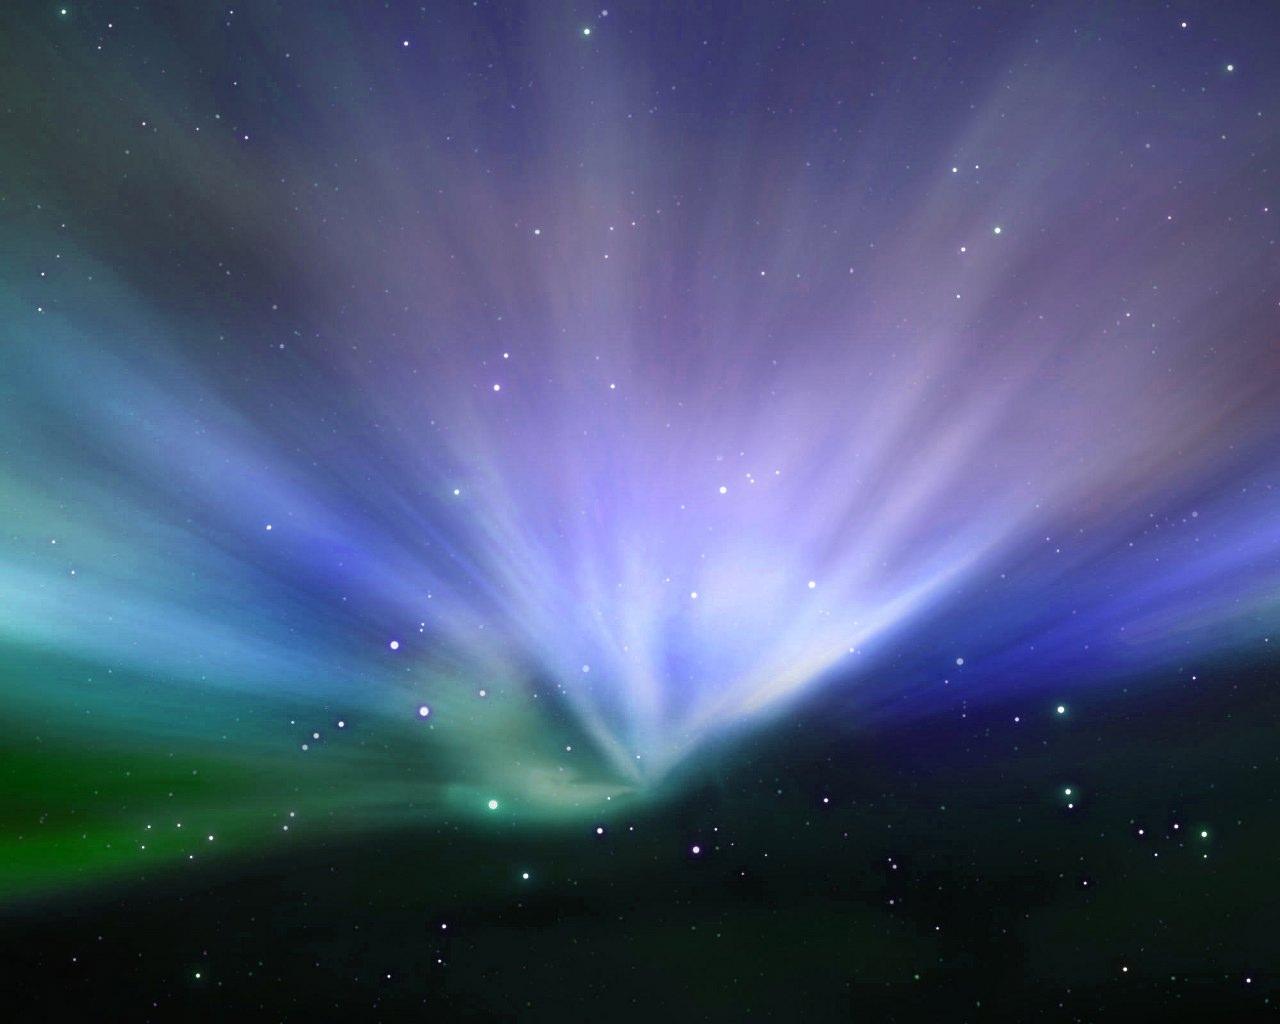 http://1.bp.blogspot.com/_2UbsSBz9ckE/TEHqMPvjKaI/AAAAAAAABRw/-nWcYn8DIP8/s1600/aurora%20mac11_1280x1024.jpg